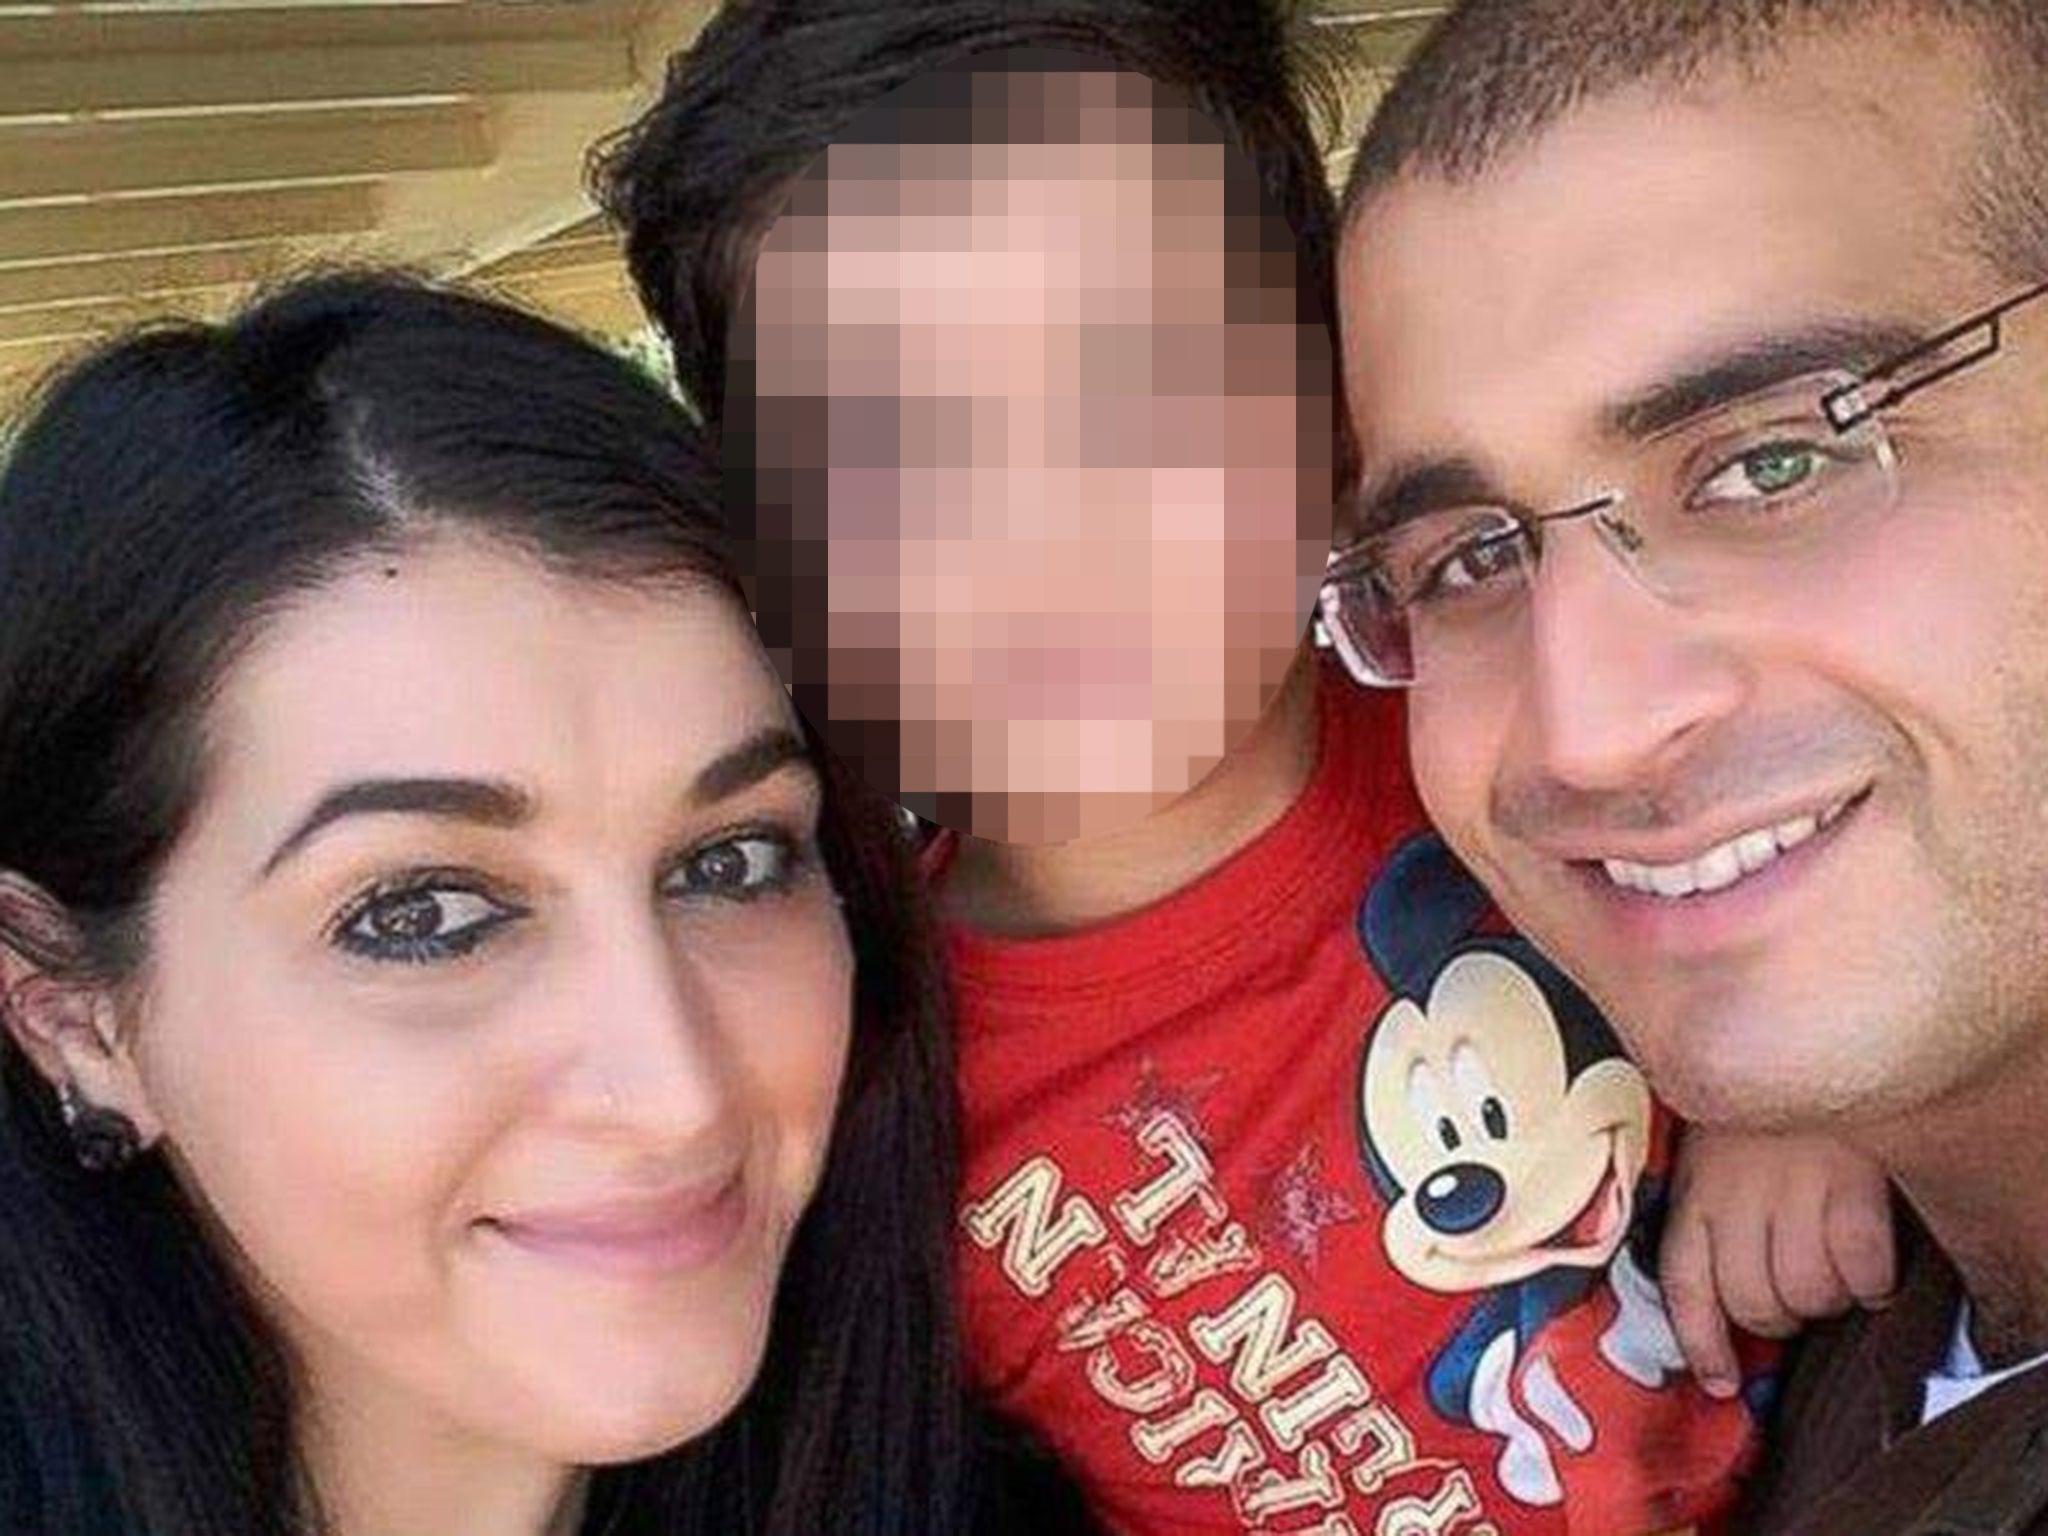 Orlando nightclub shooter\'s widow found not guilty of aiding husband ...